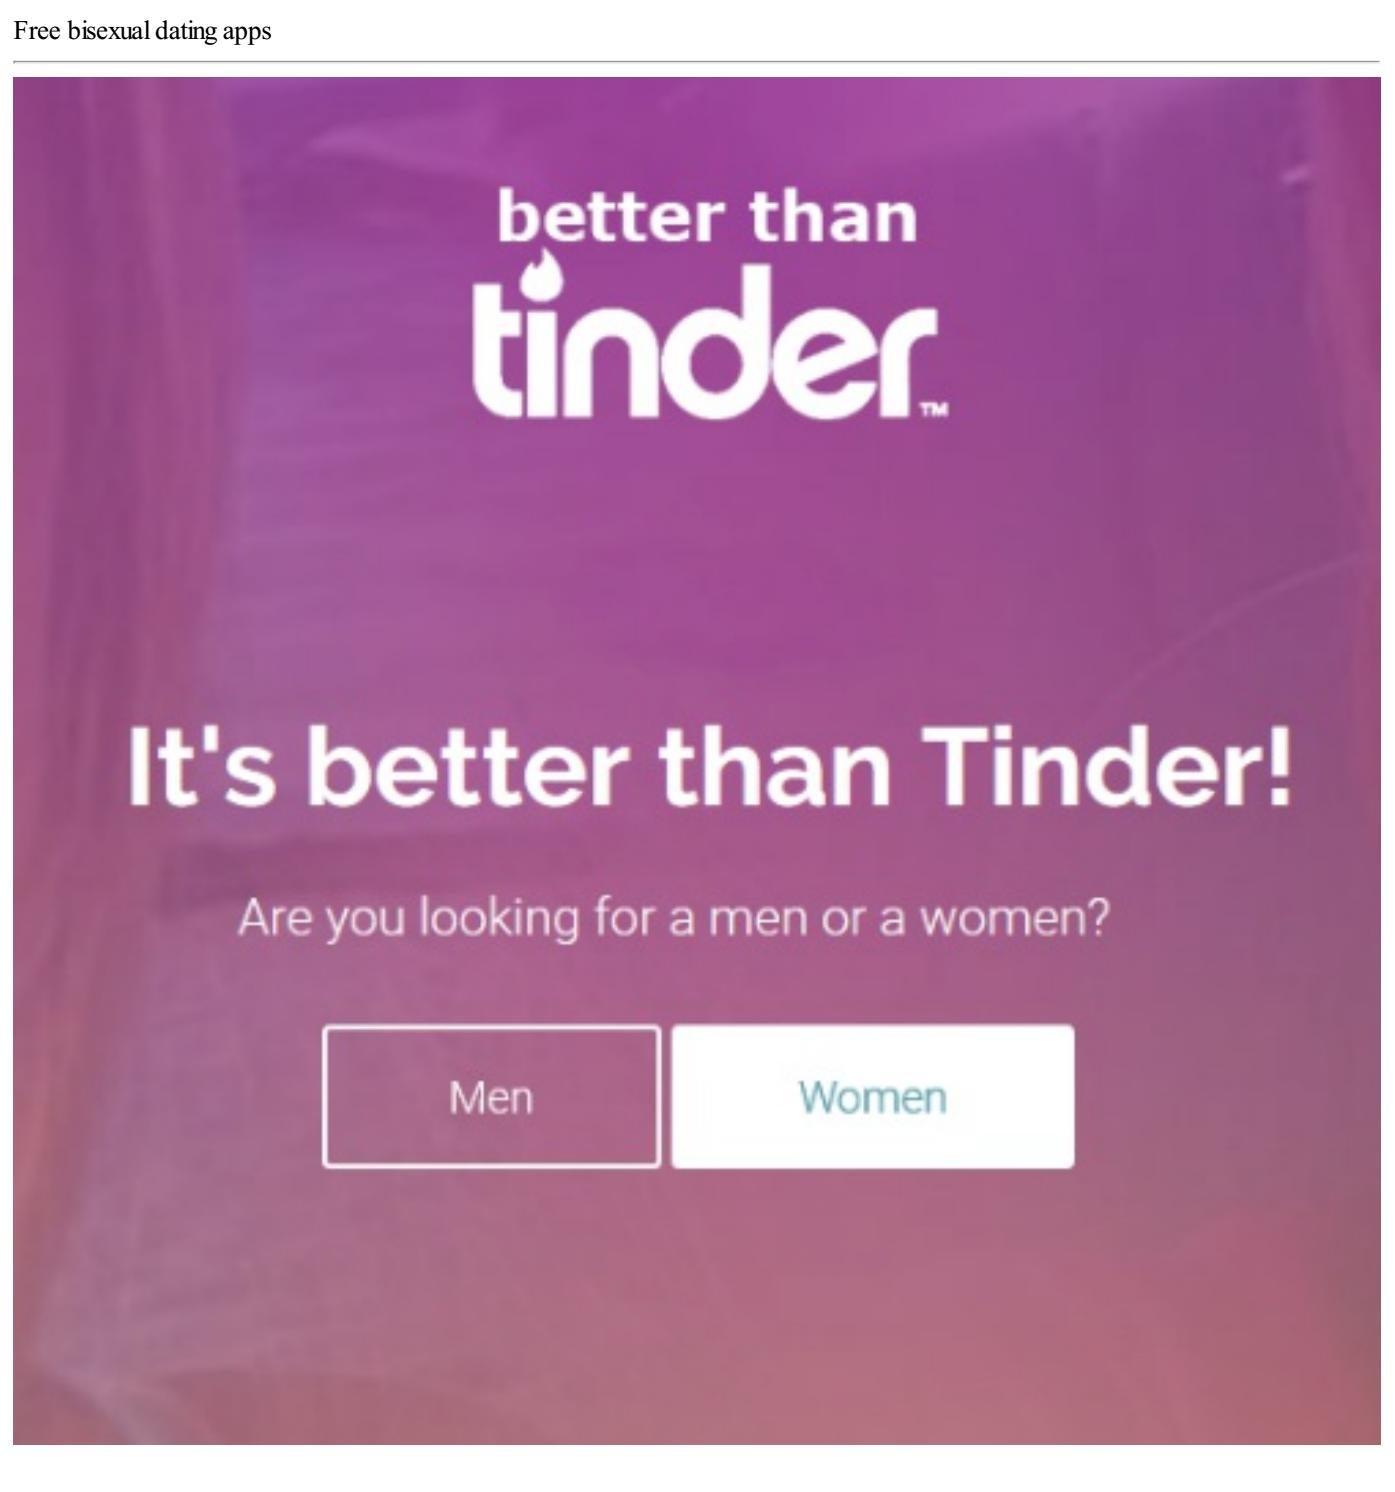 Free bisexual images